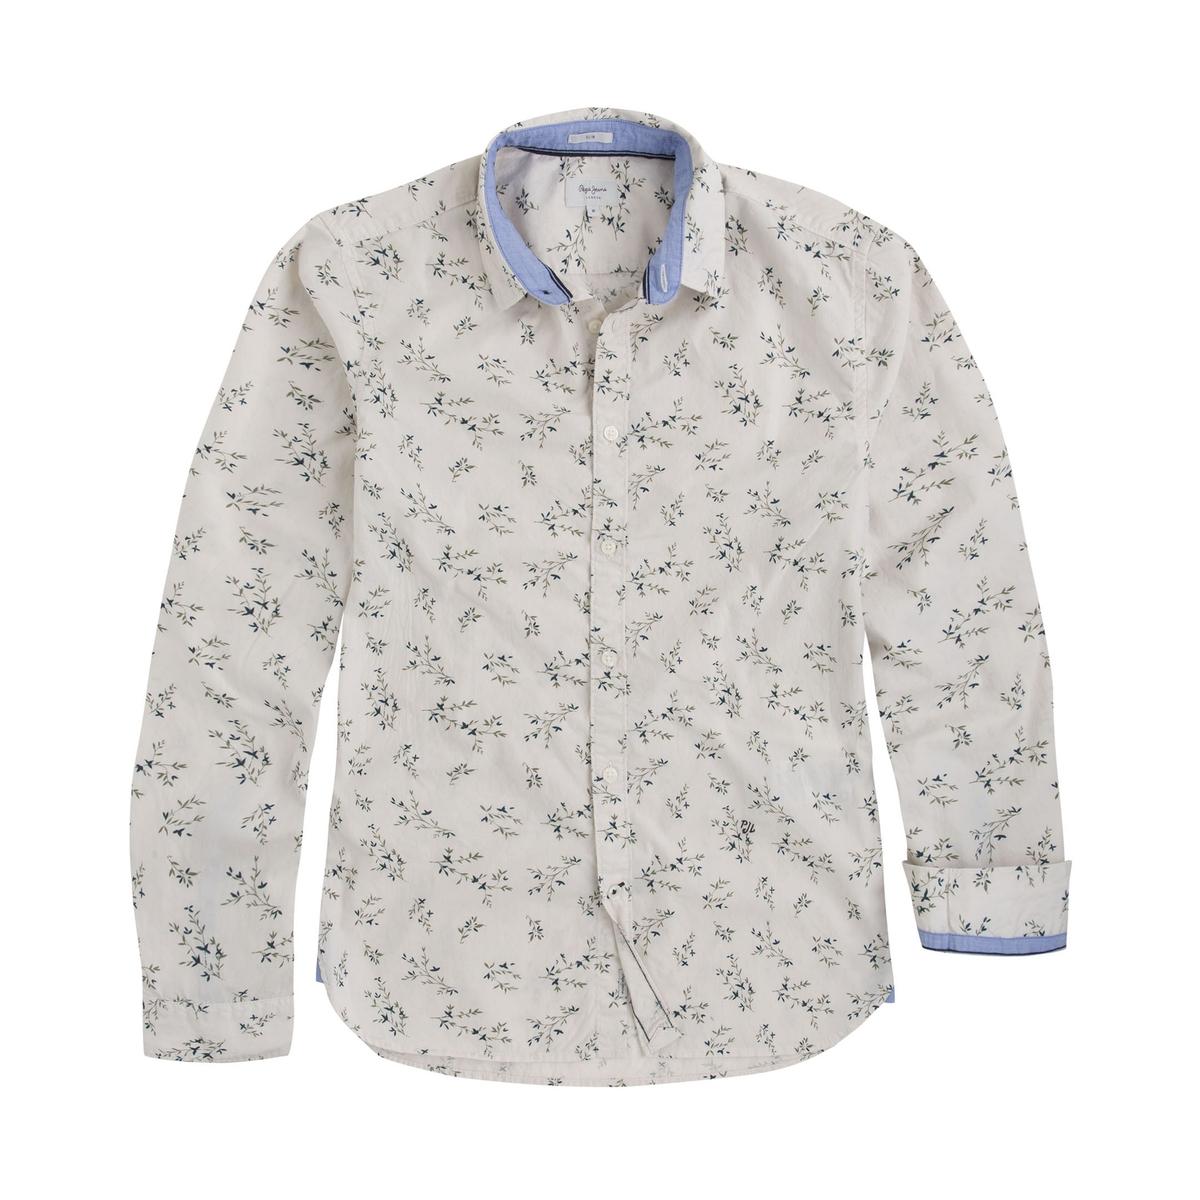 Camisa recta estampada de lino, manga larga